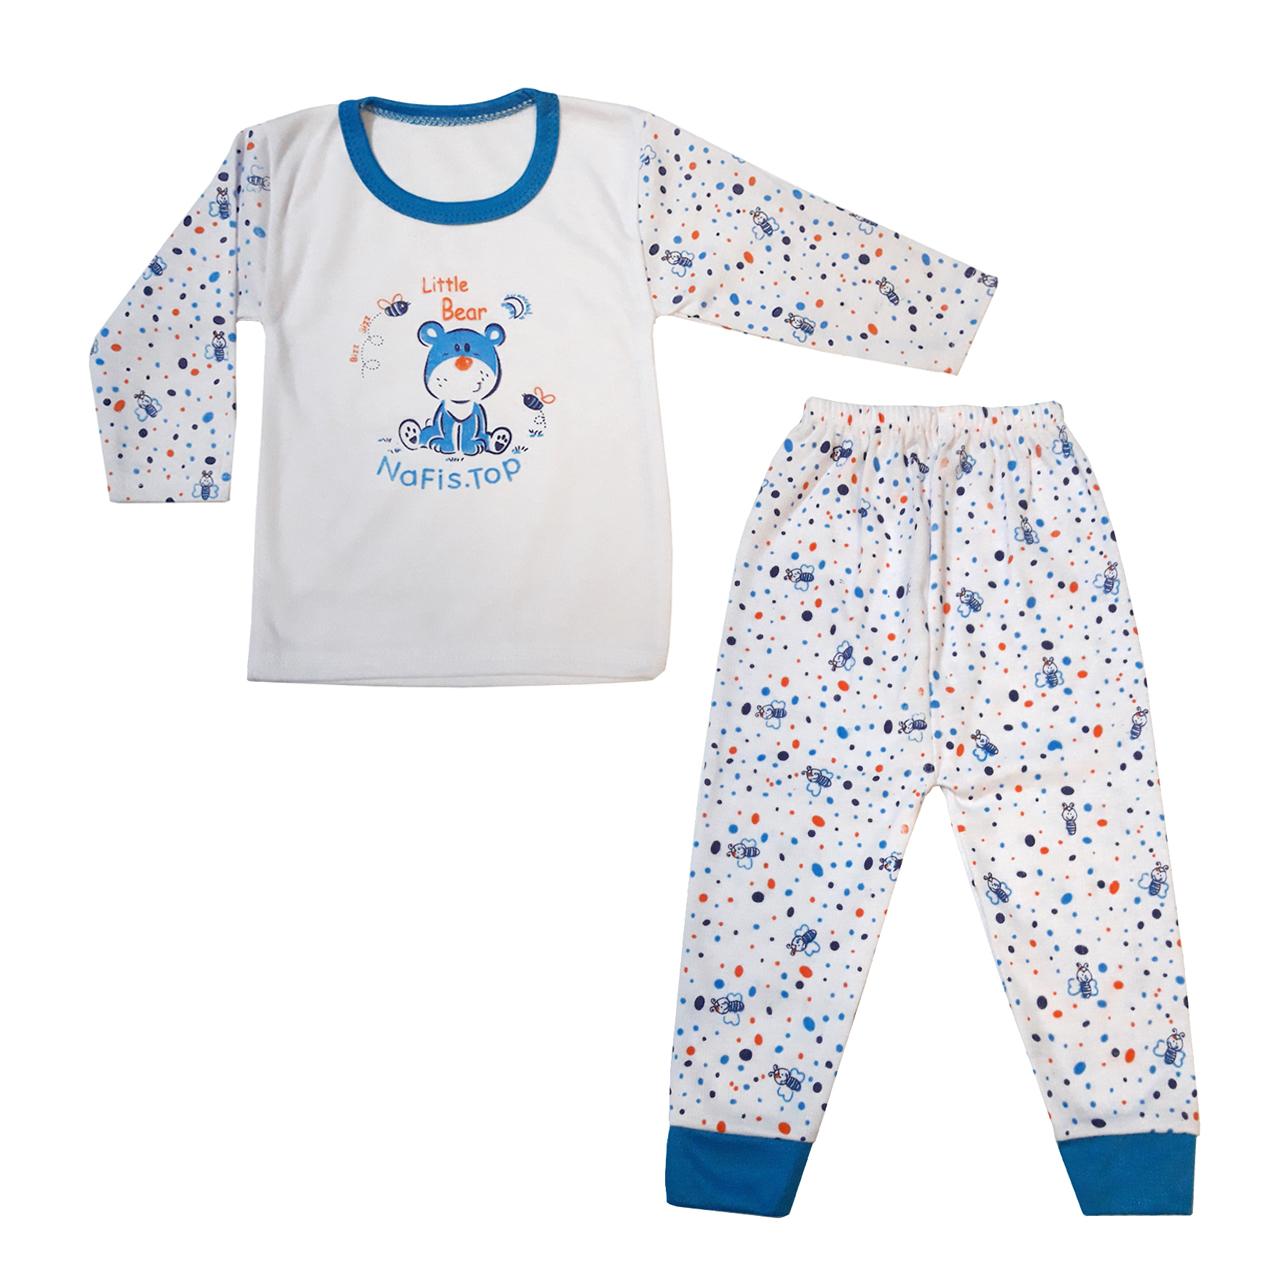 ست تی شرت و شلوار  نوزادی مدل Little Bear کد BL0